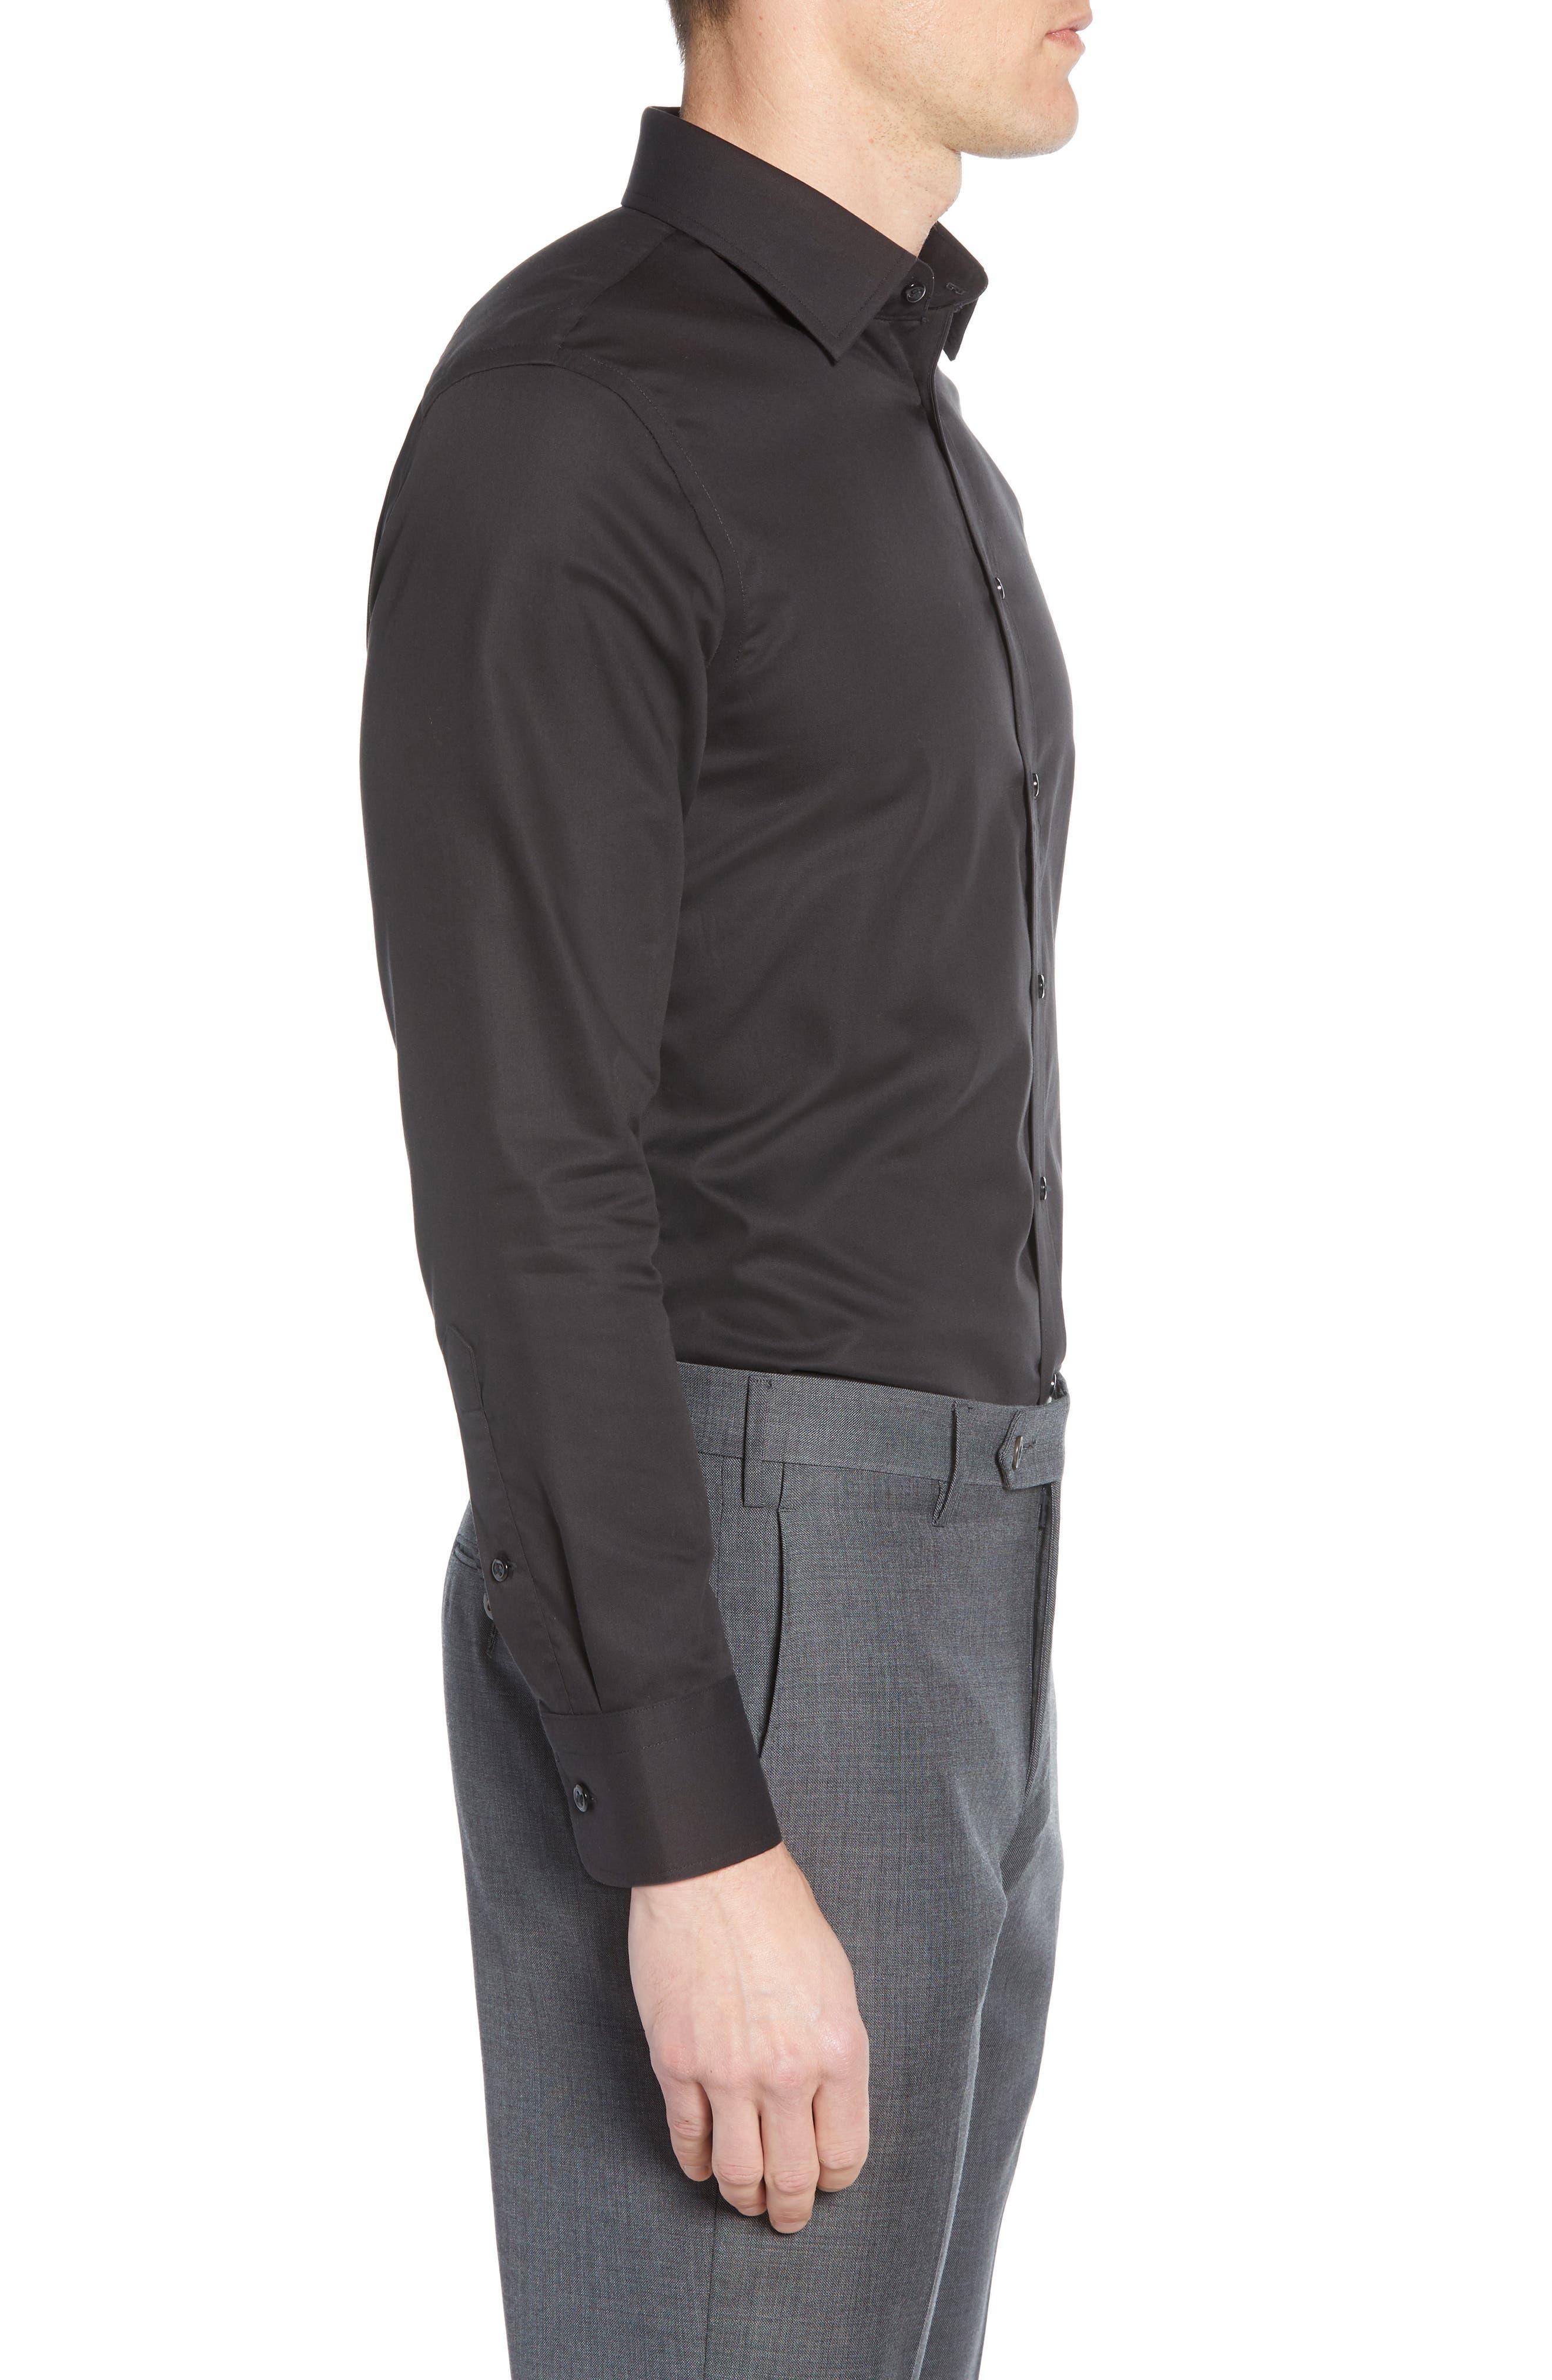 NORDSTROM MEN'S SHOP,                             Extra Trim Fit Non-Iron Solid Dress Shirt,                             Alternate thumbnail 4, color,                             BLACK ROCK